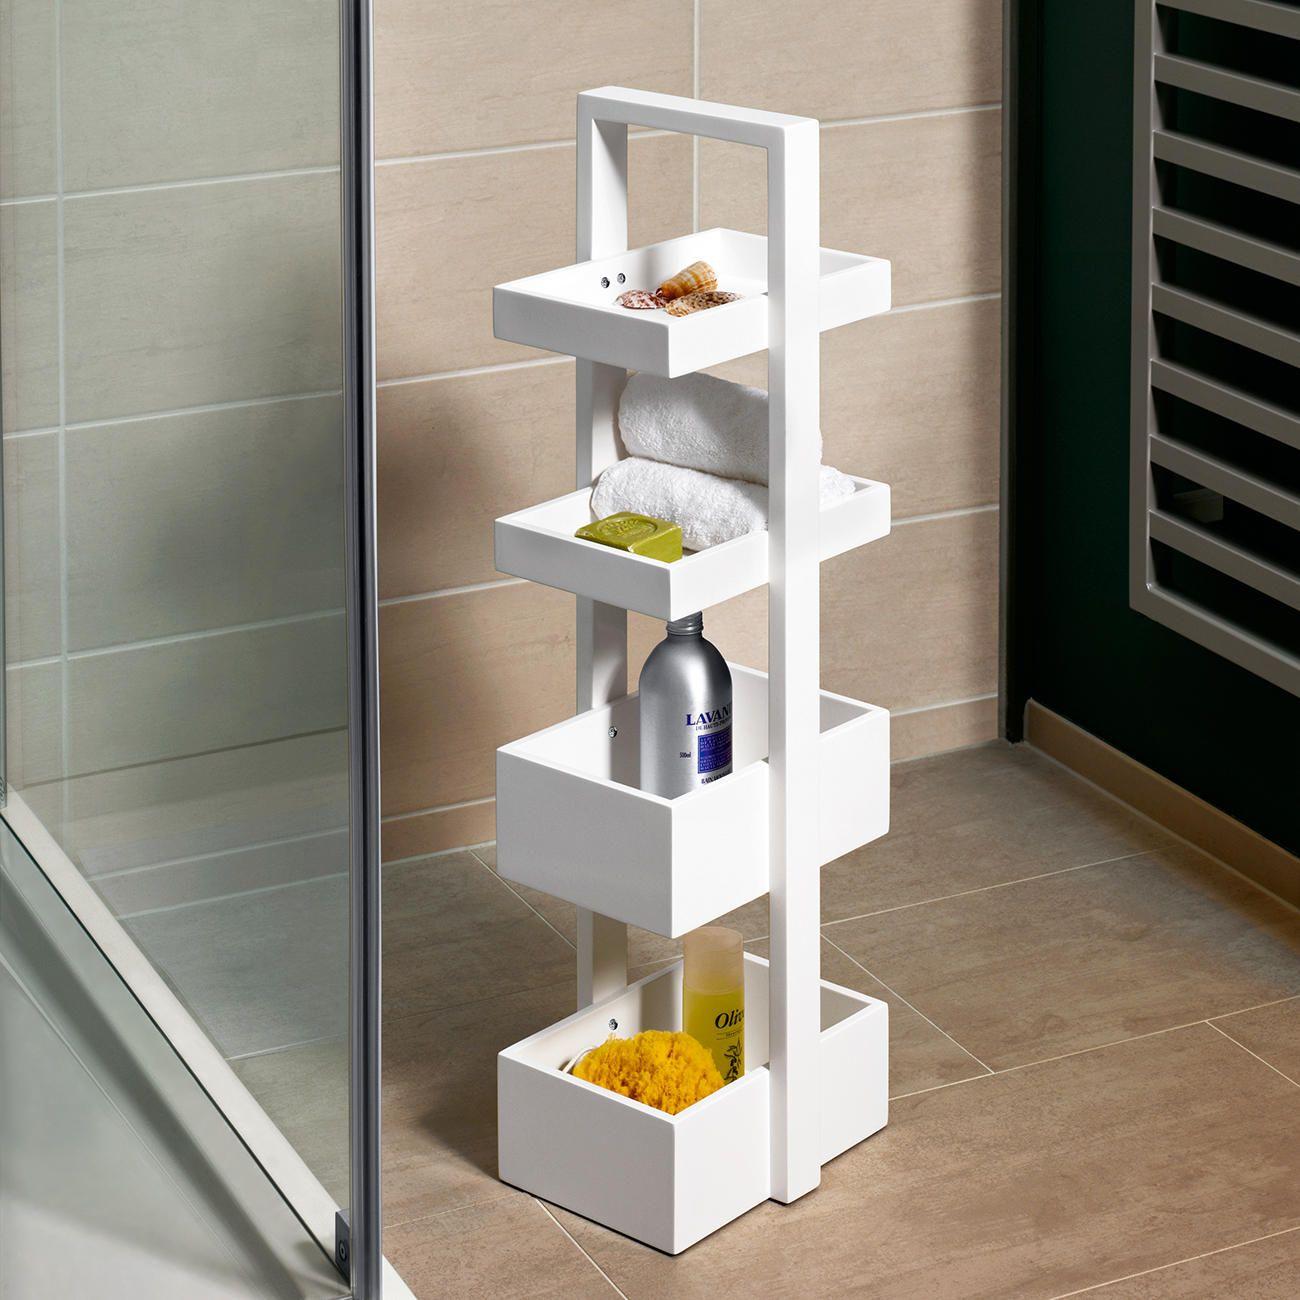 Regal Fürs Badezimmer | Jtleigh.com - Hausgestaltung Ideen